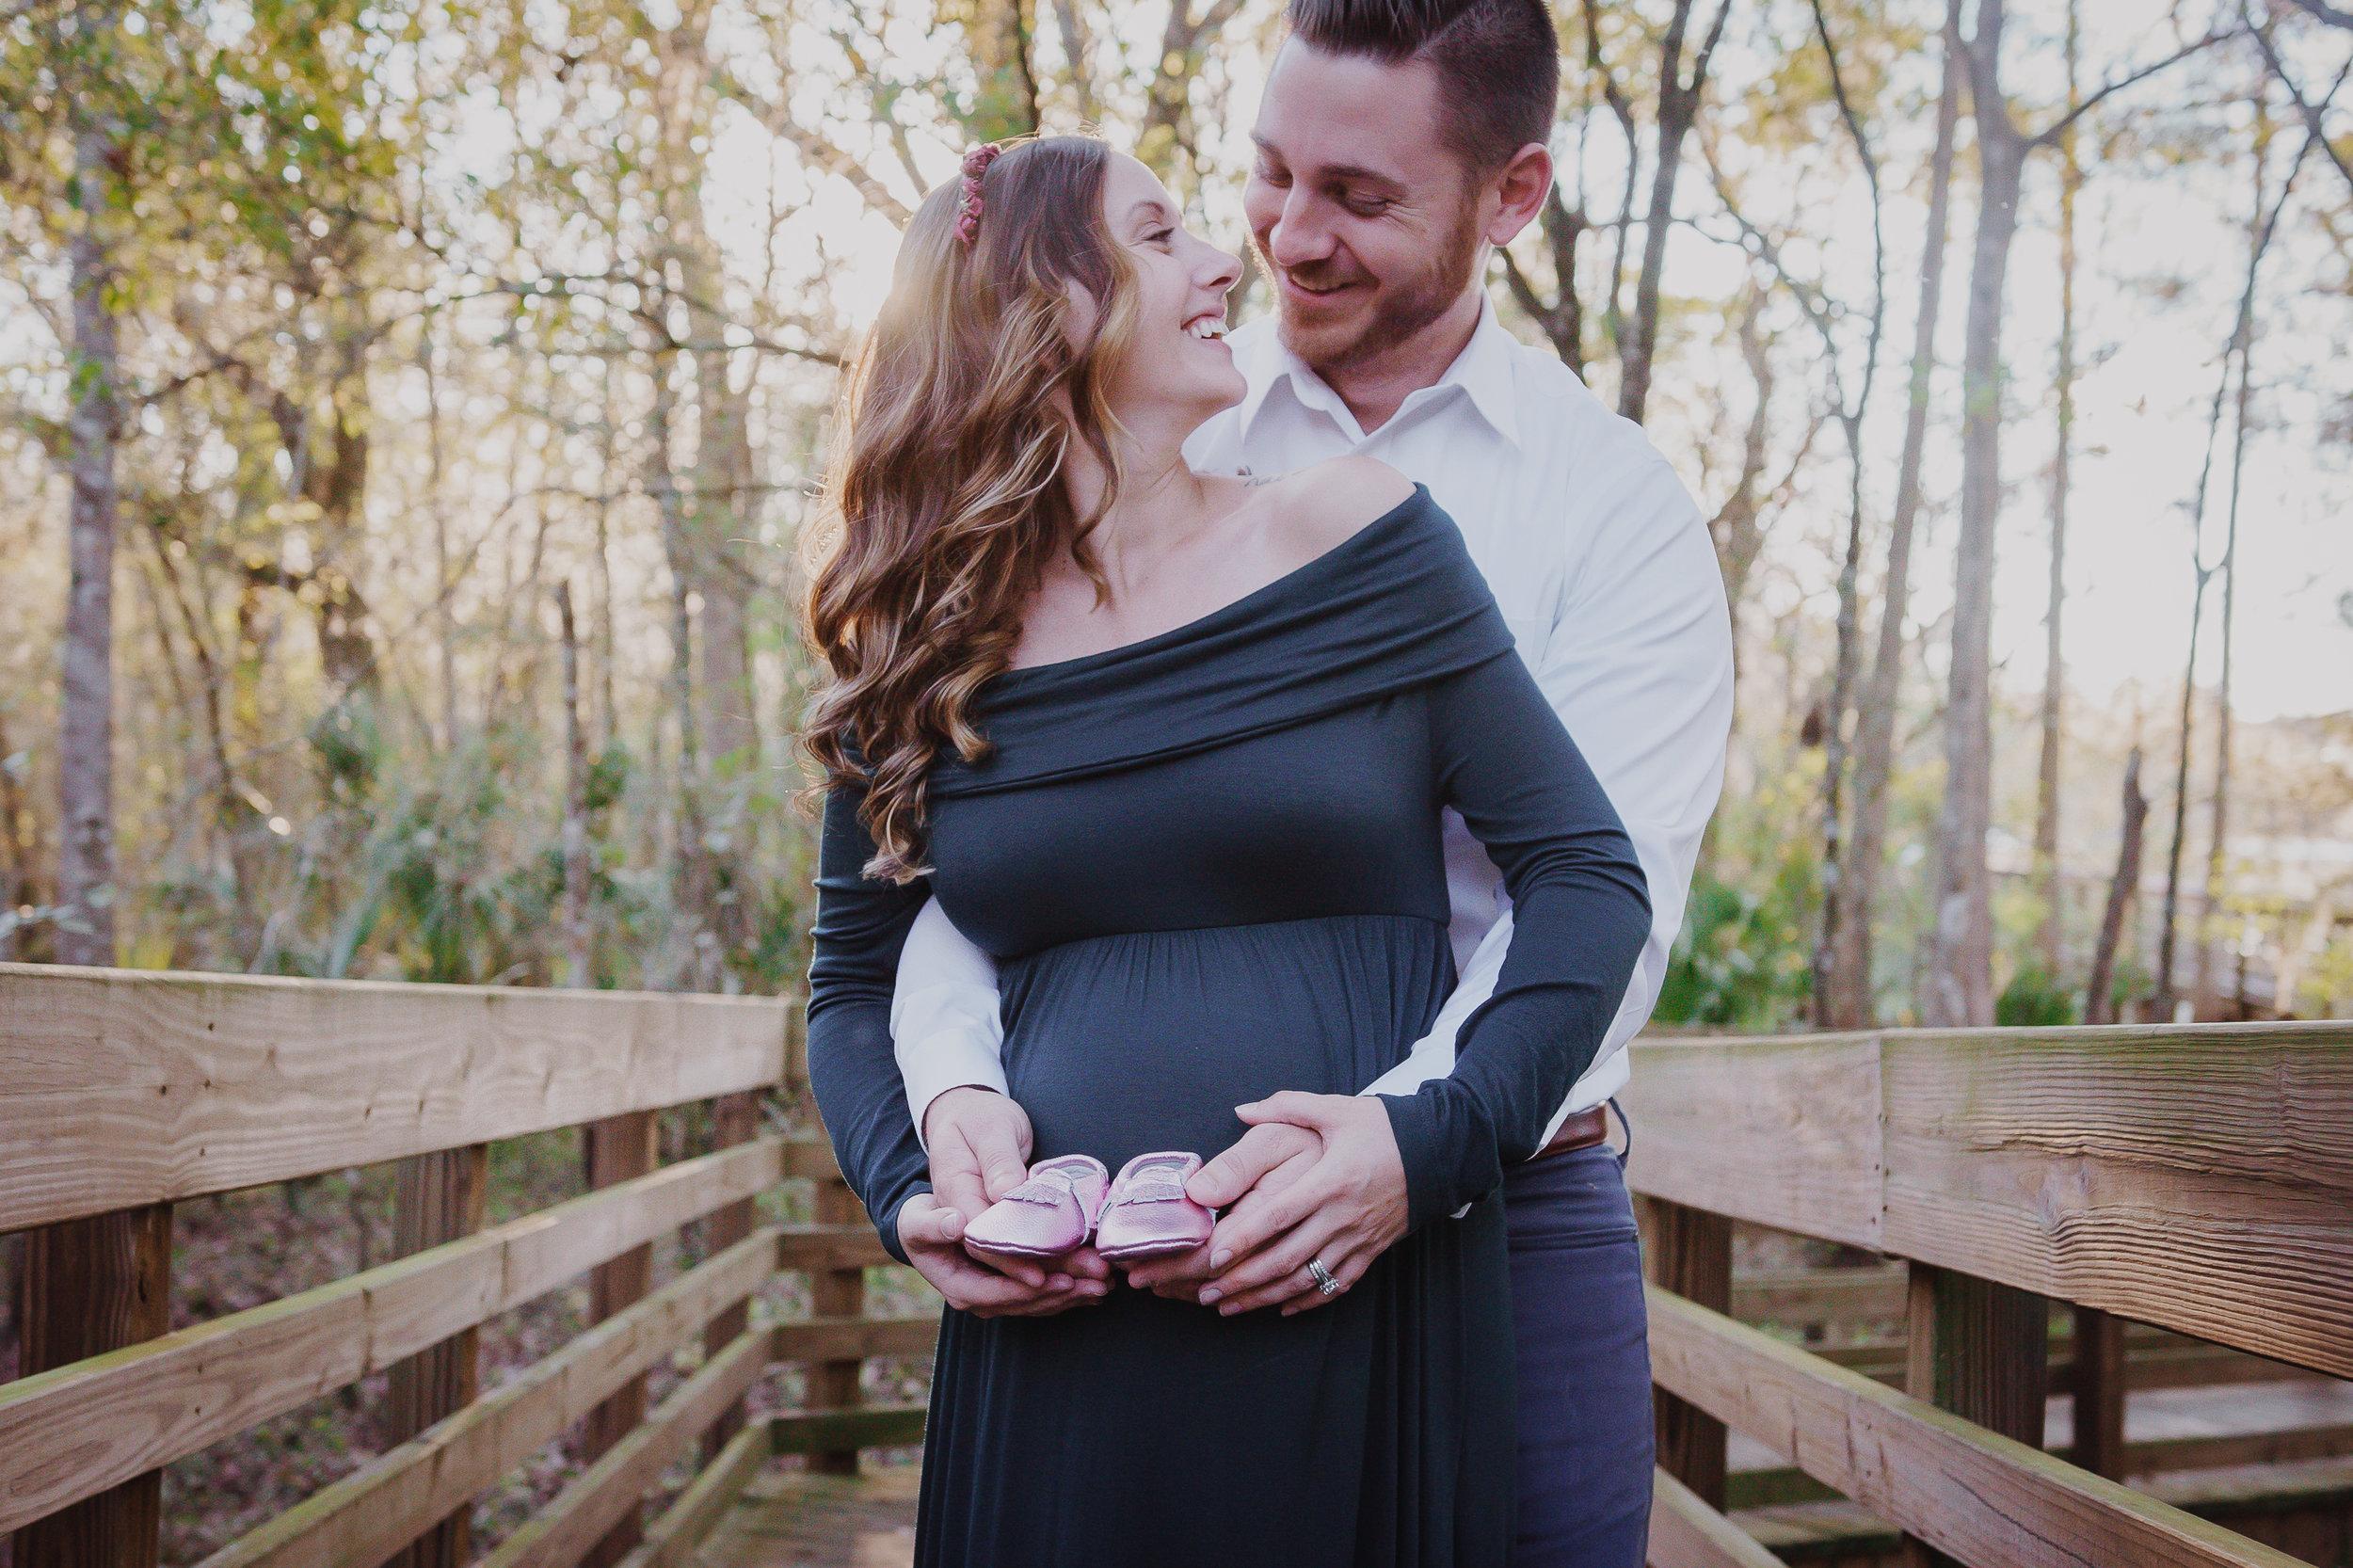 Tampa-maternity-photographer, couple-photo